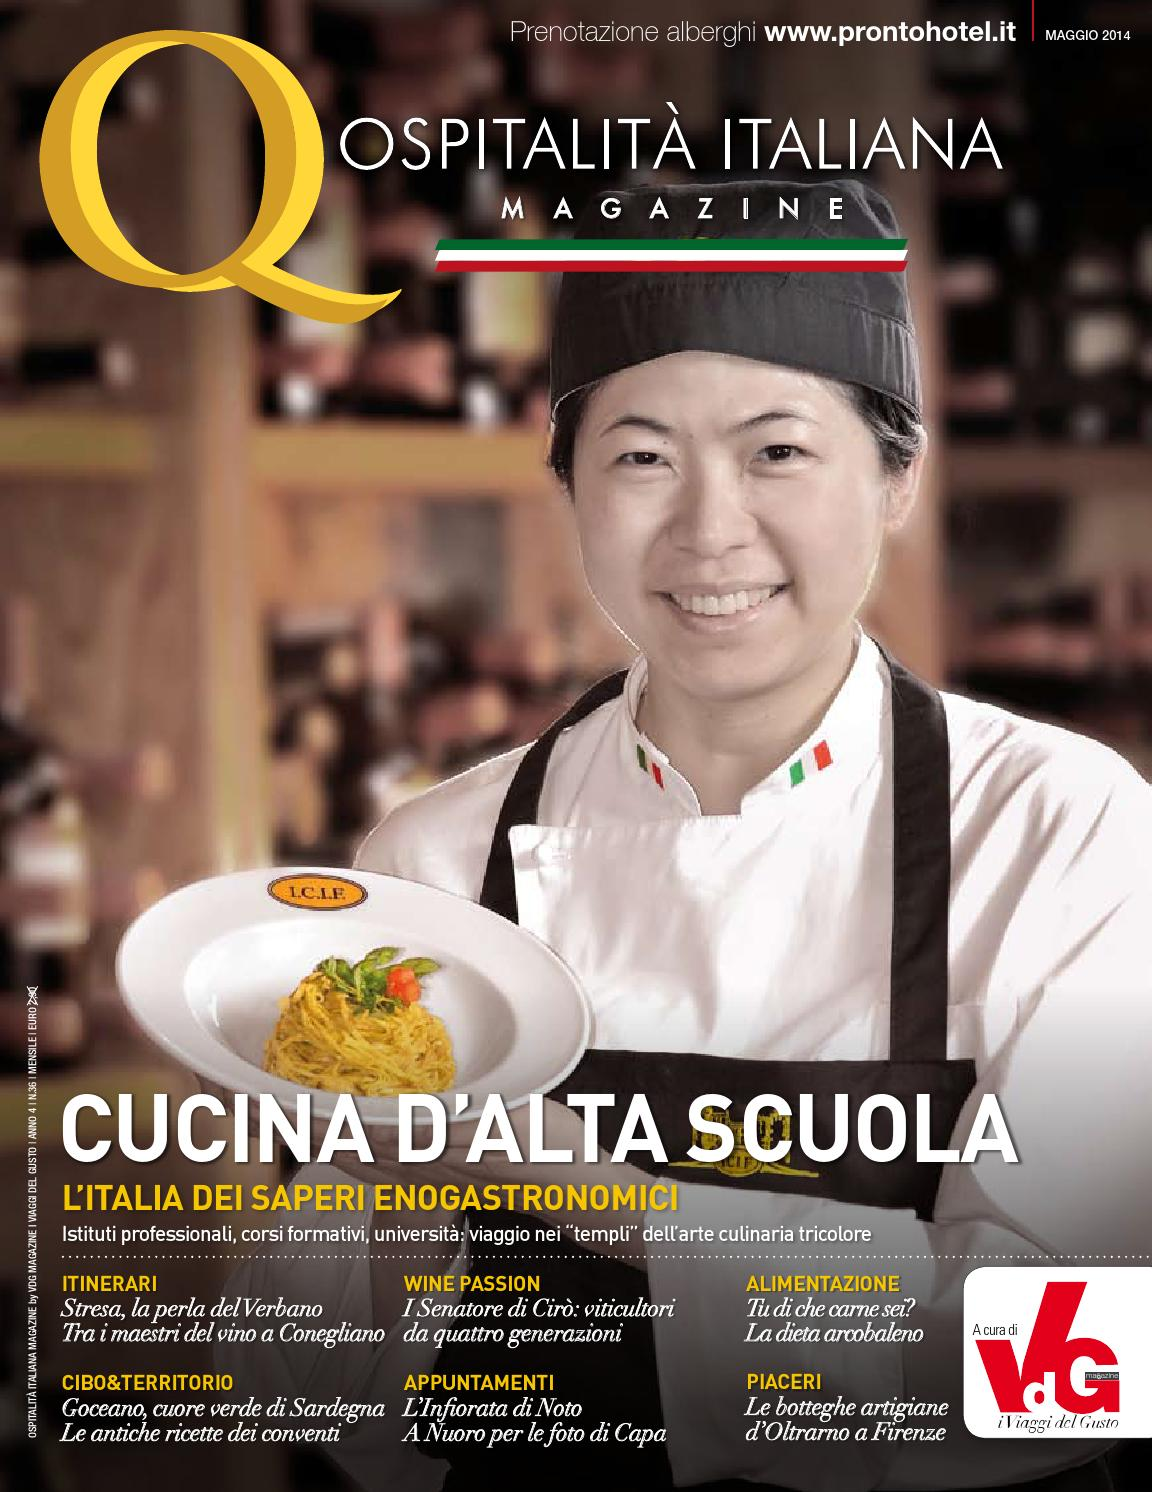 Osp ita maggio 2014 by vdgmagazine - issuu e5efc1c14bf4